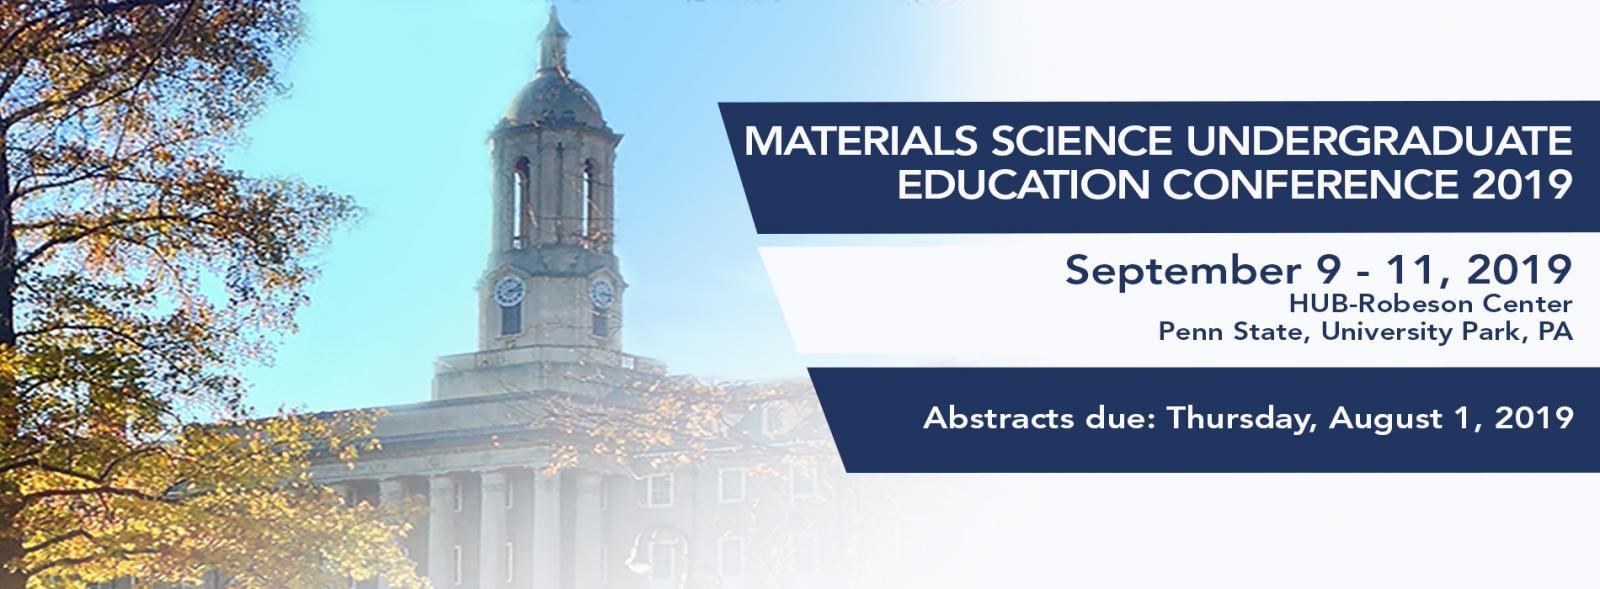 Materials Science Undergraduate Education Conference